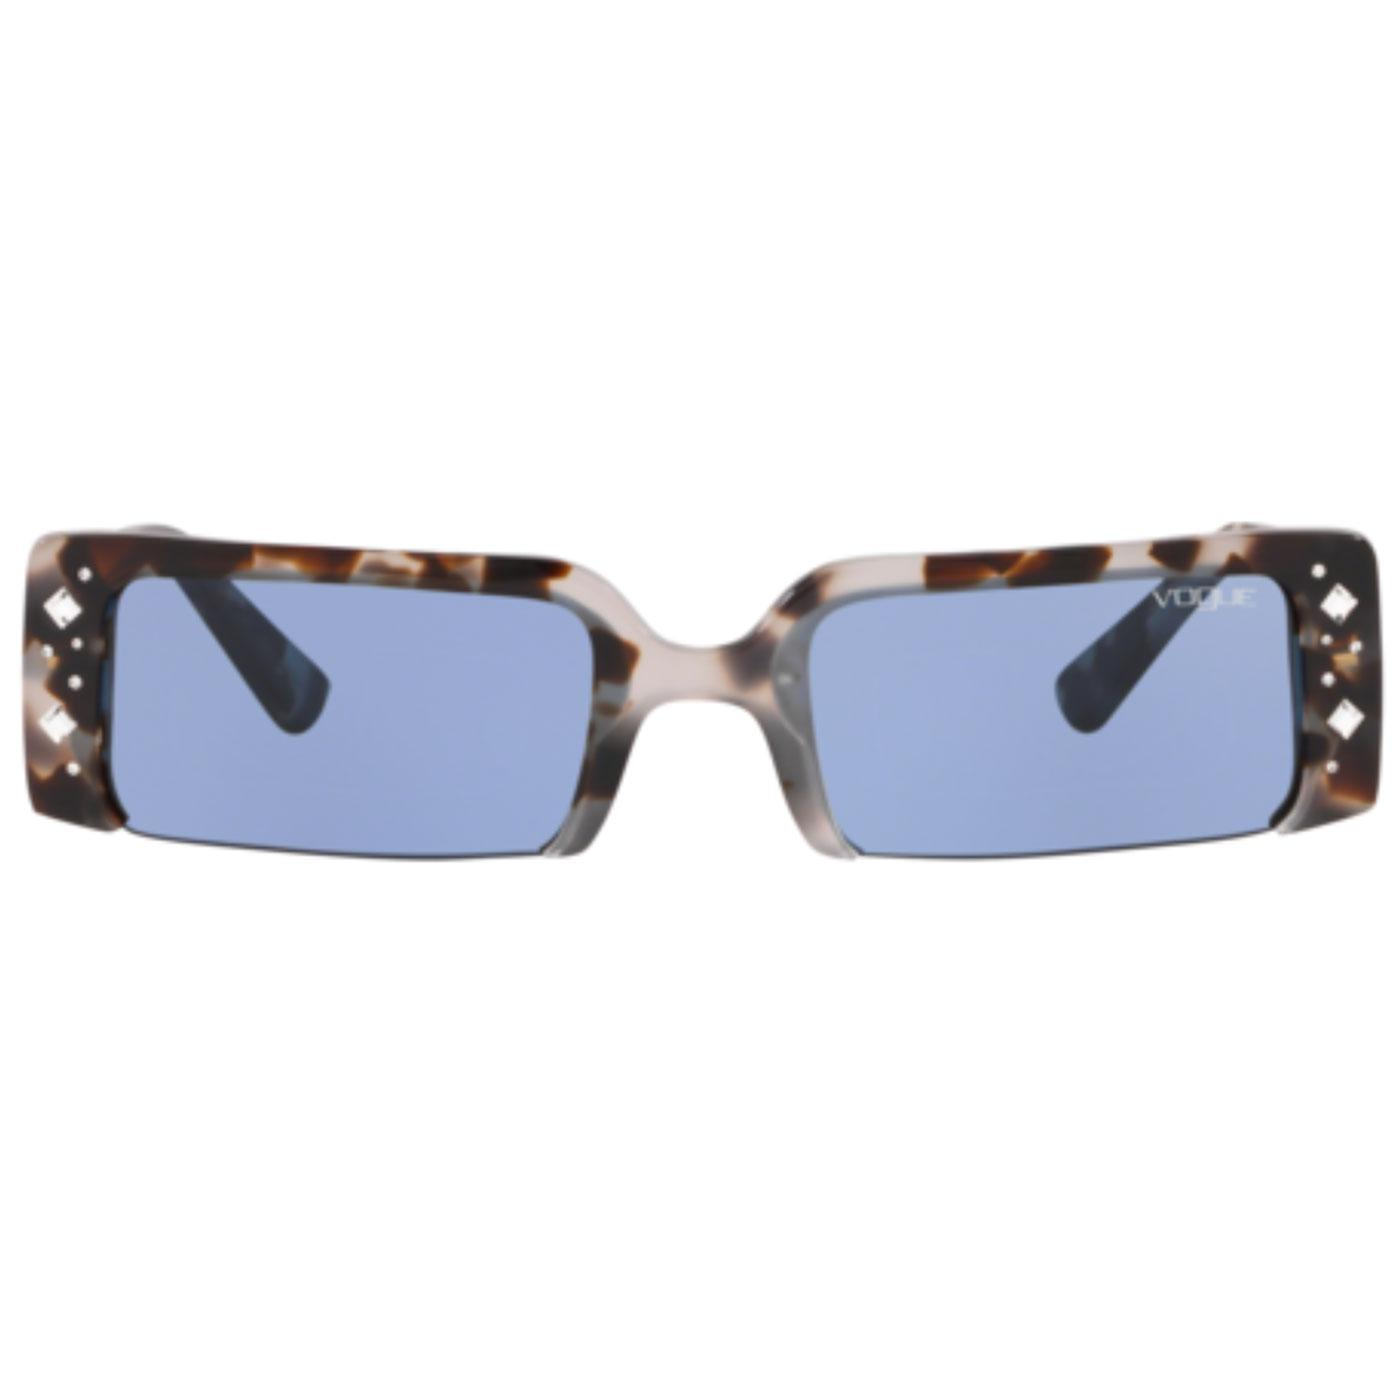 Soho VOGUE x GIGI HADID Retro Square Sunglasses G